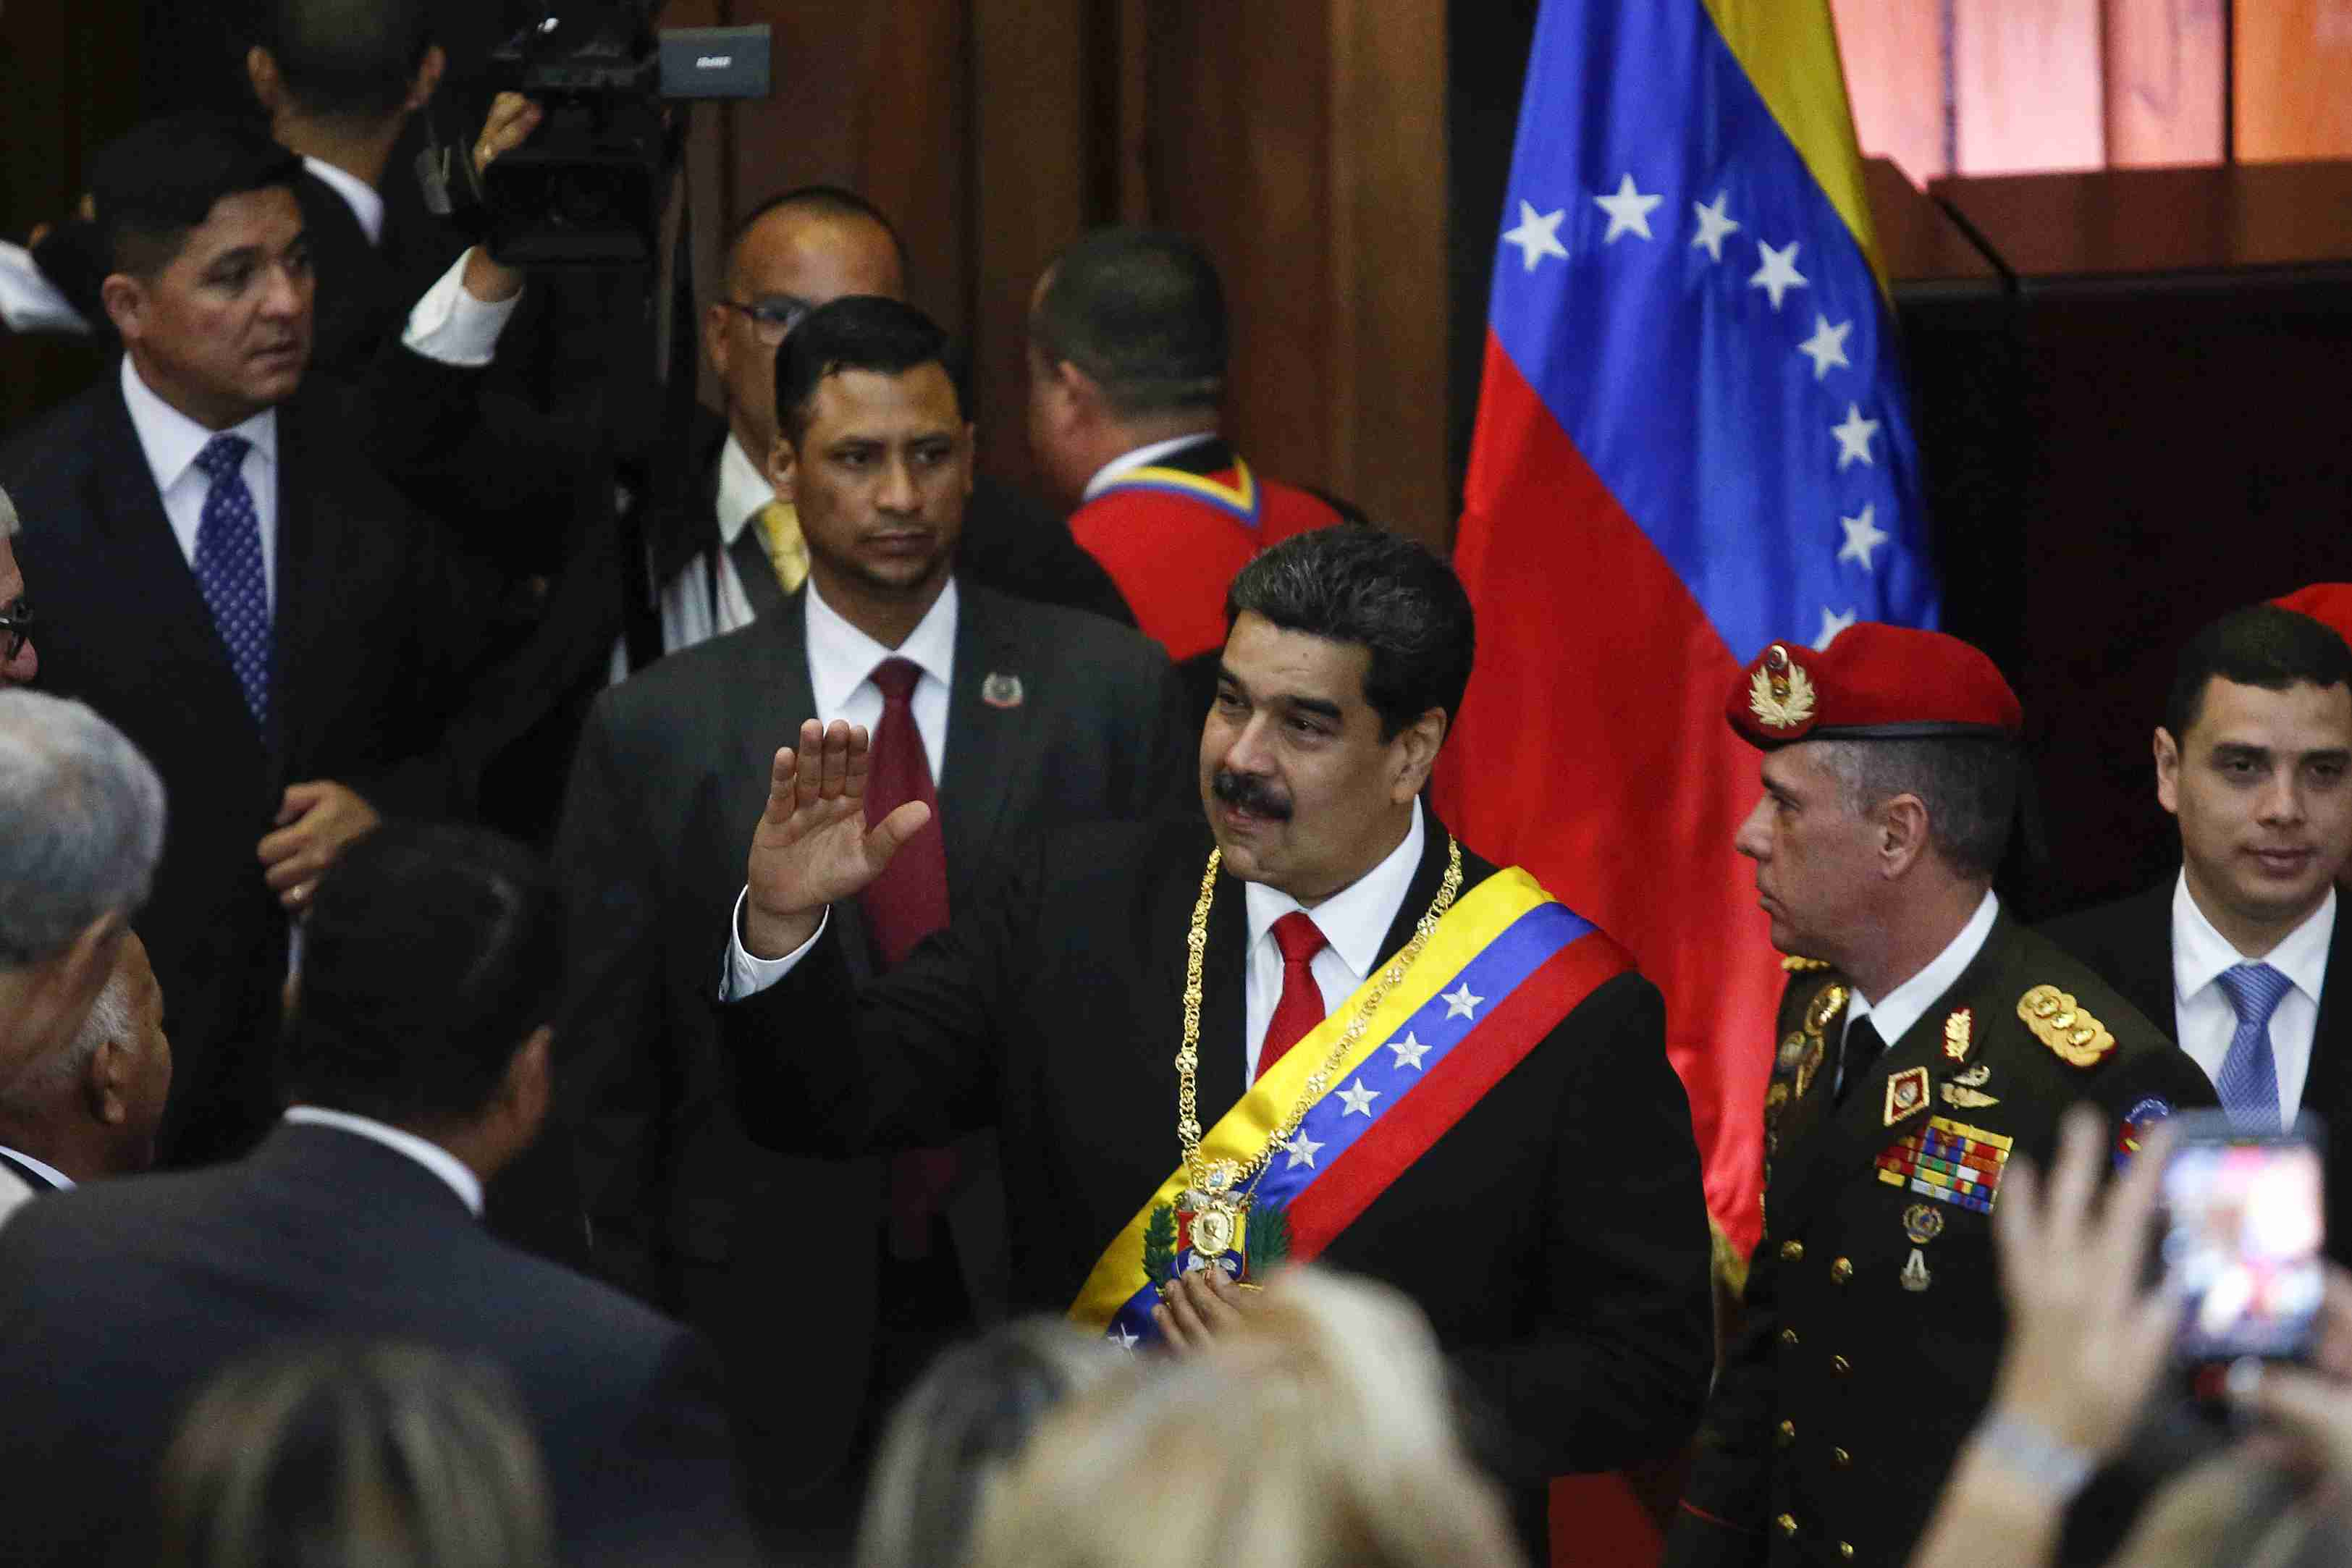 President of Venezuela Nicolás Maduro greets attendants